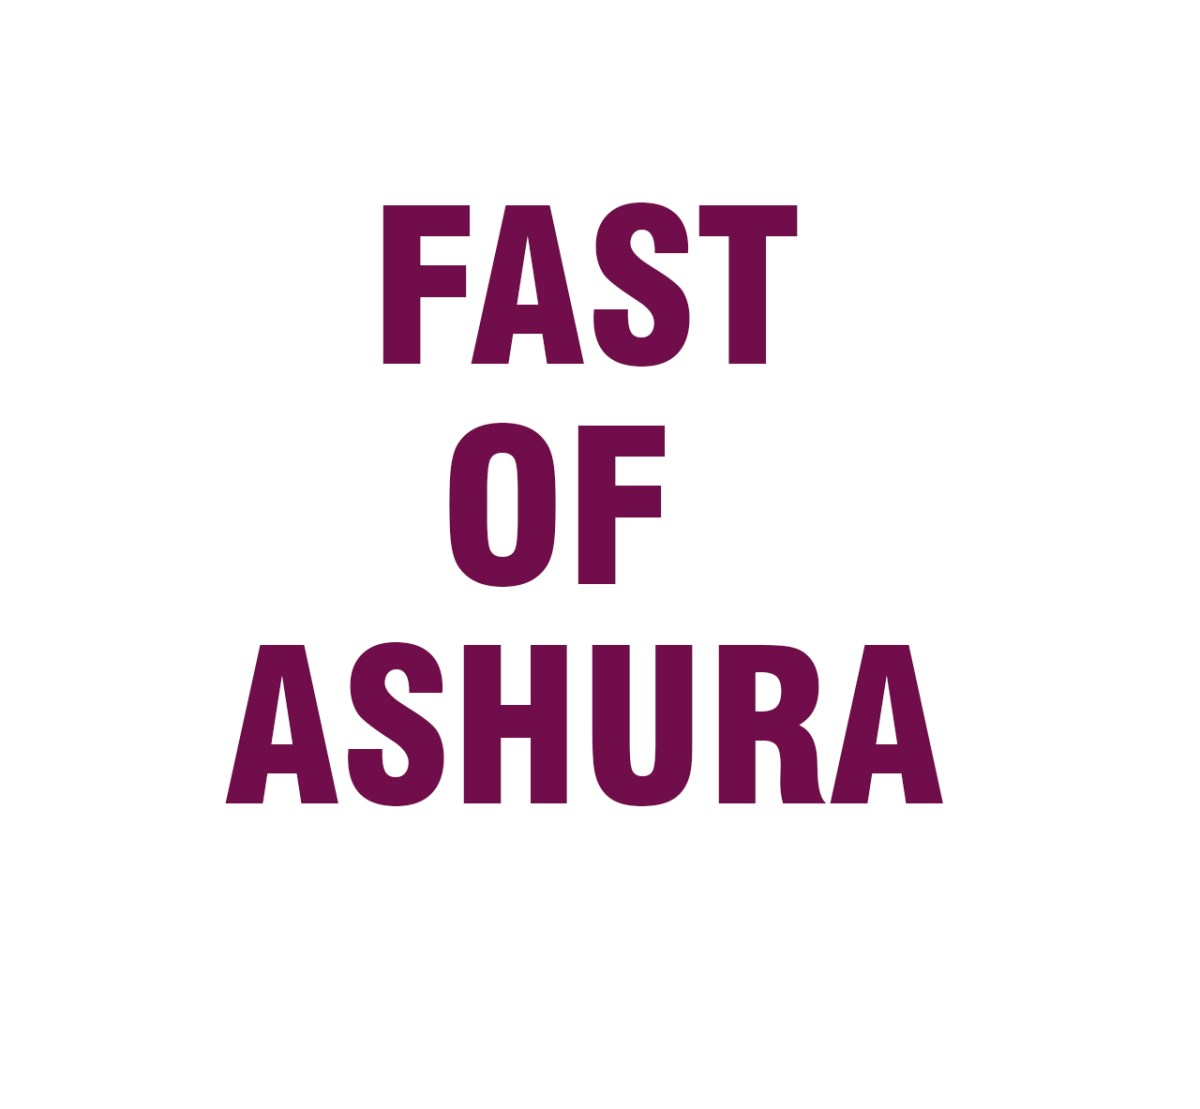 fast of ashura